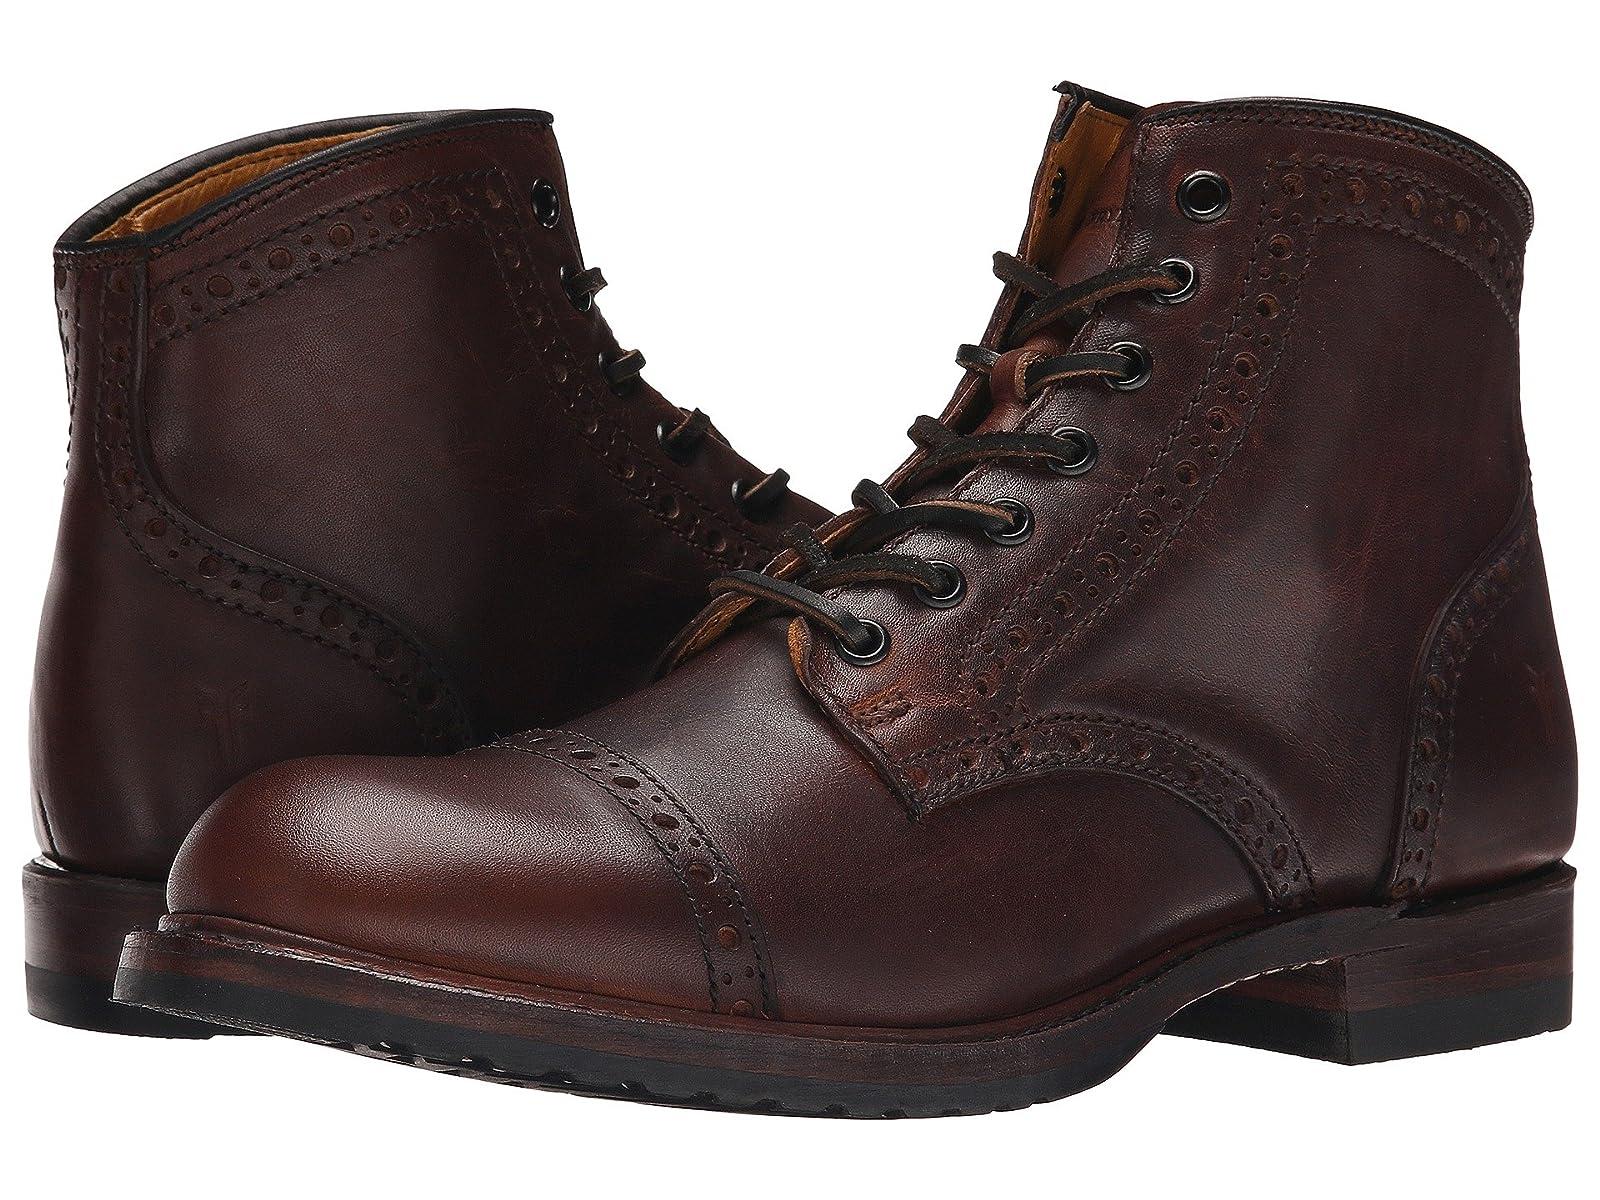 Frye Logan Brogue Cap ToeAffordable and distinctive shoes